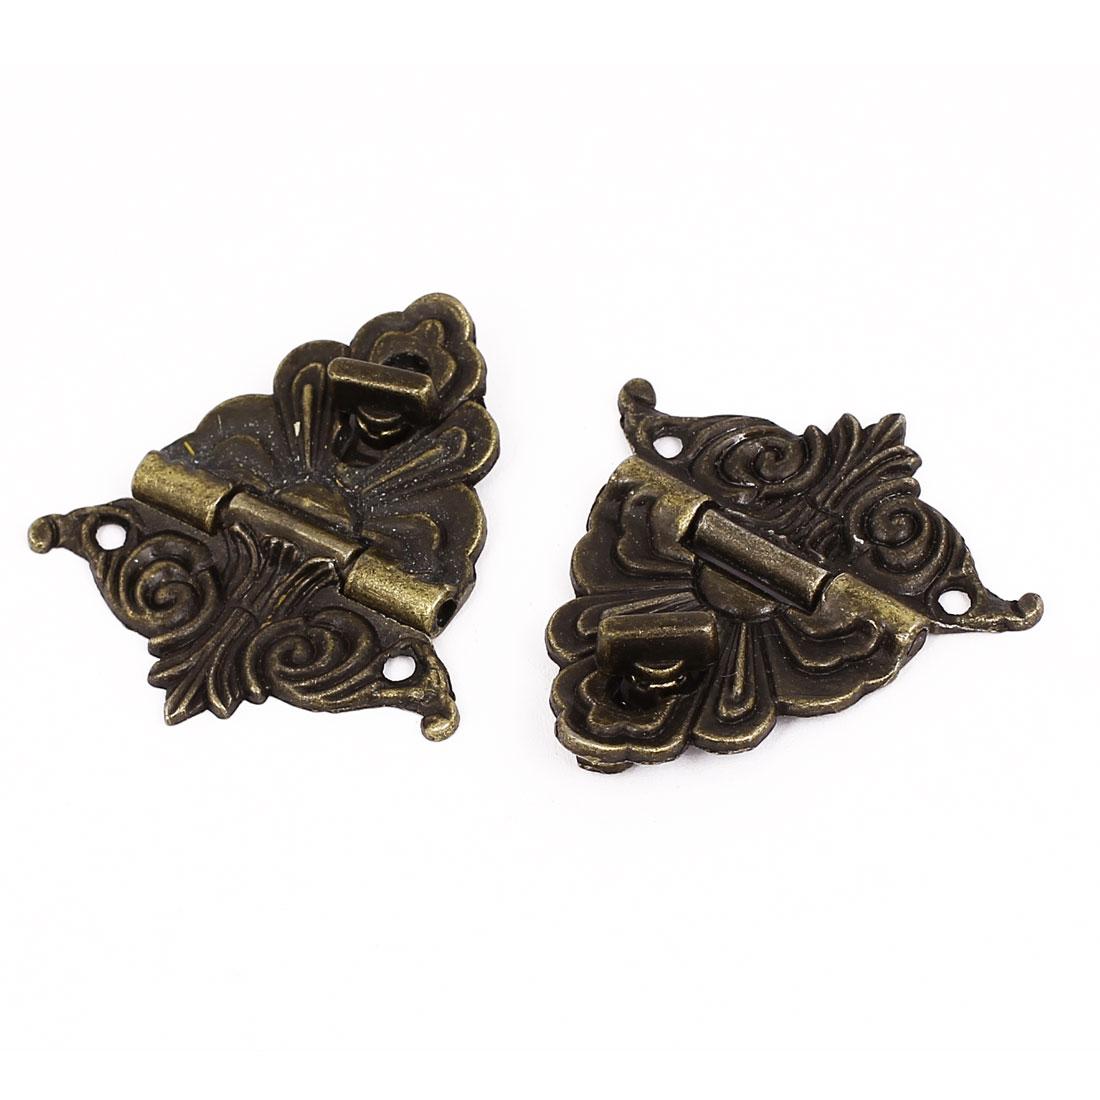 UXCELL Hinge Antique Style Wooden Case Jewelry Box Hasp Latch Bronze Tone 2 Set(China (Mainland))